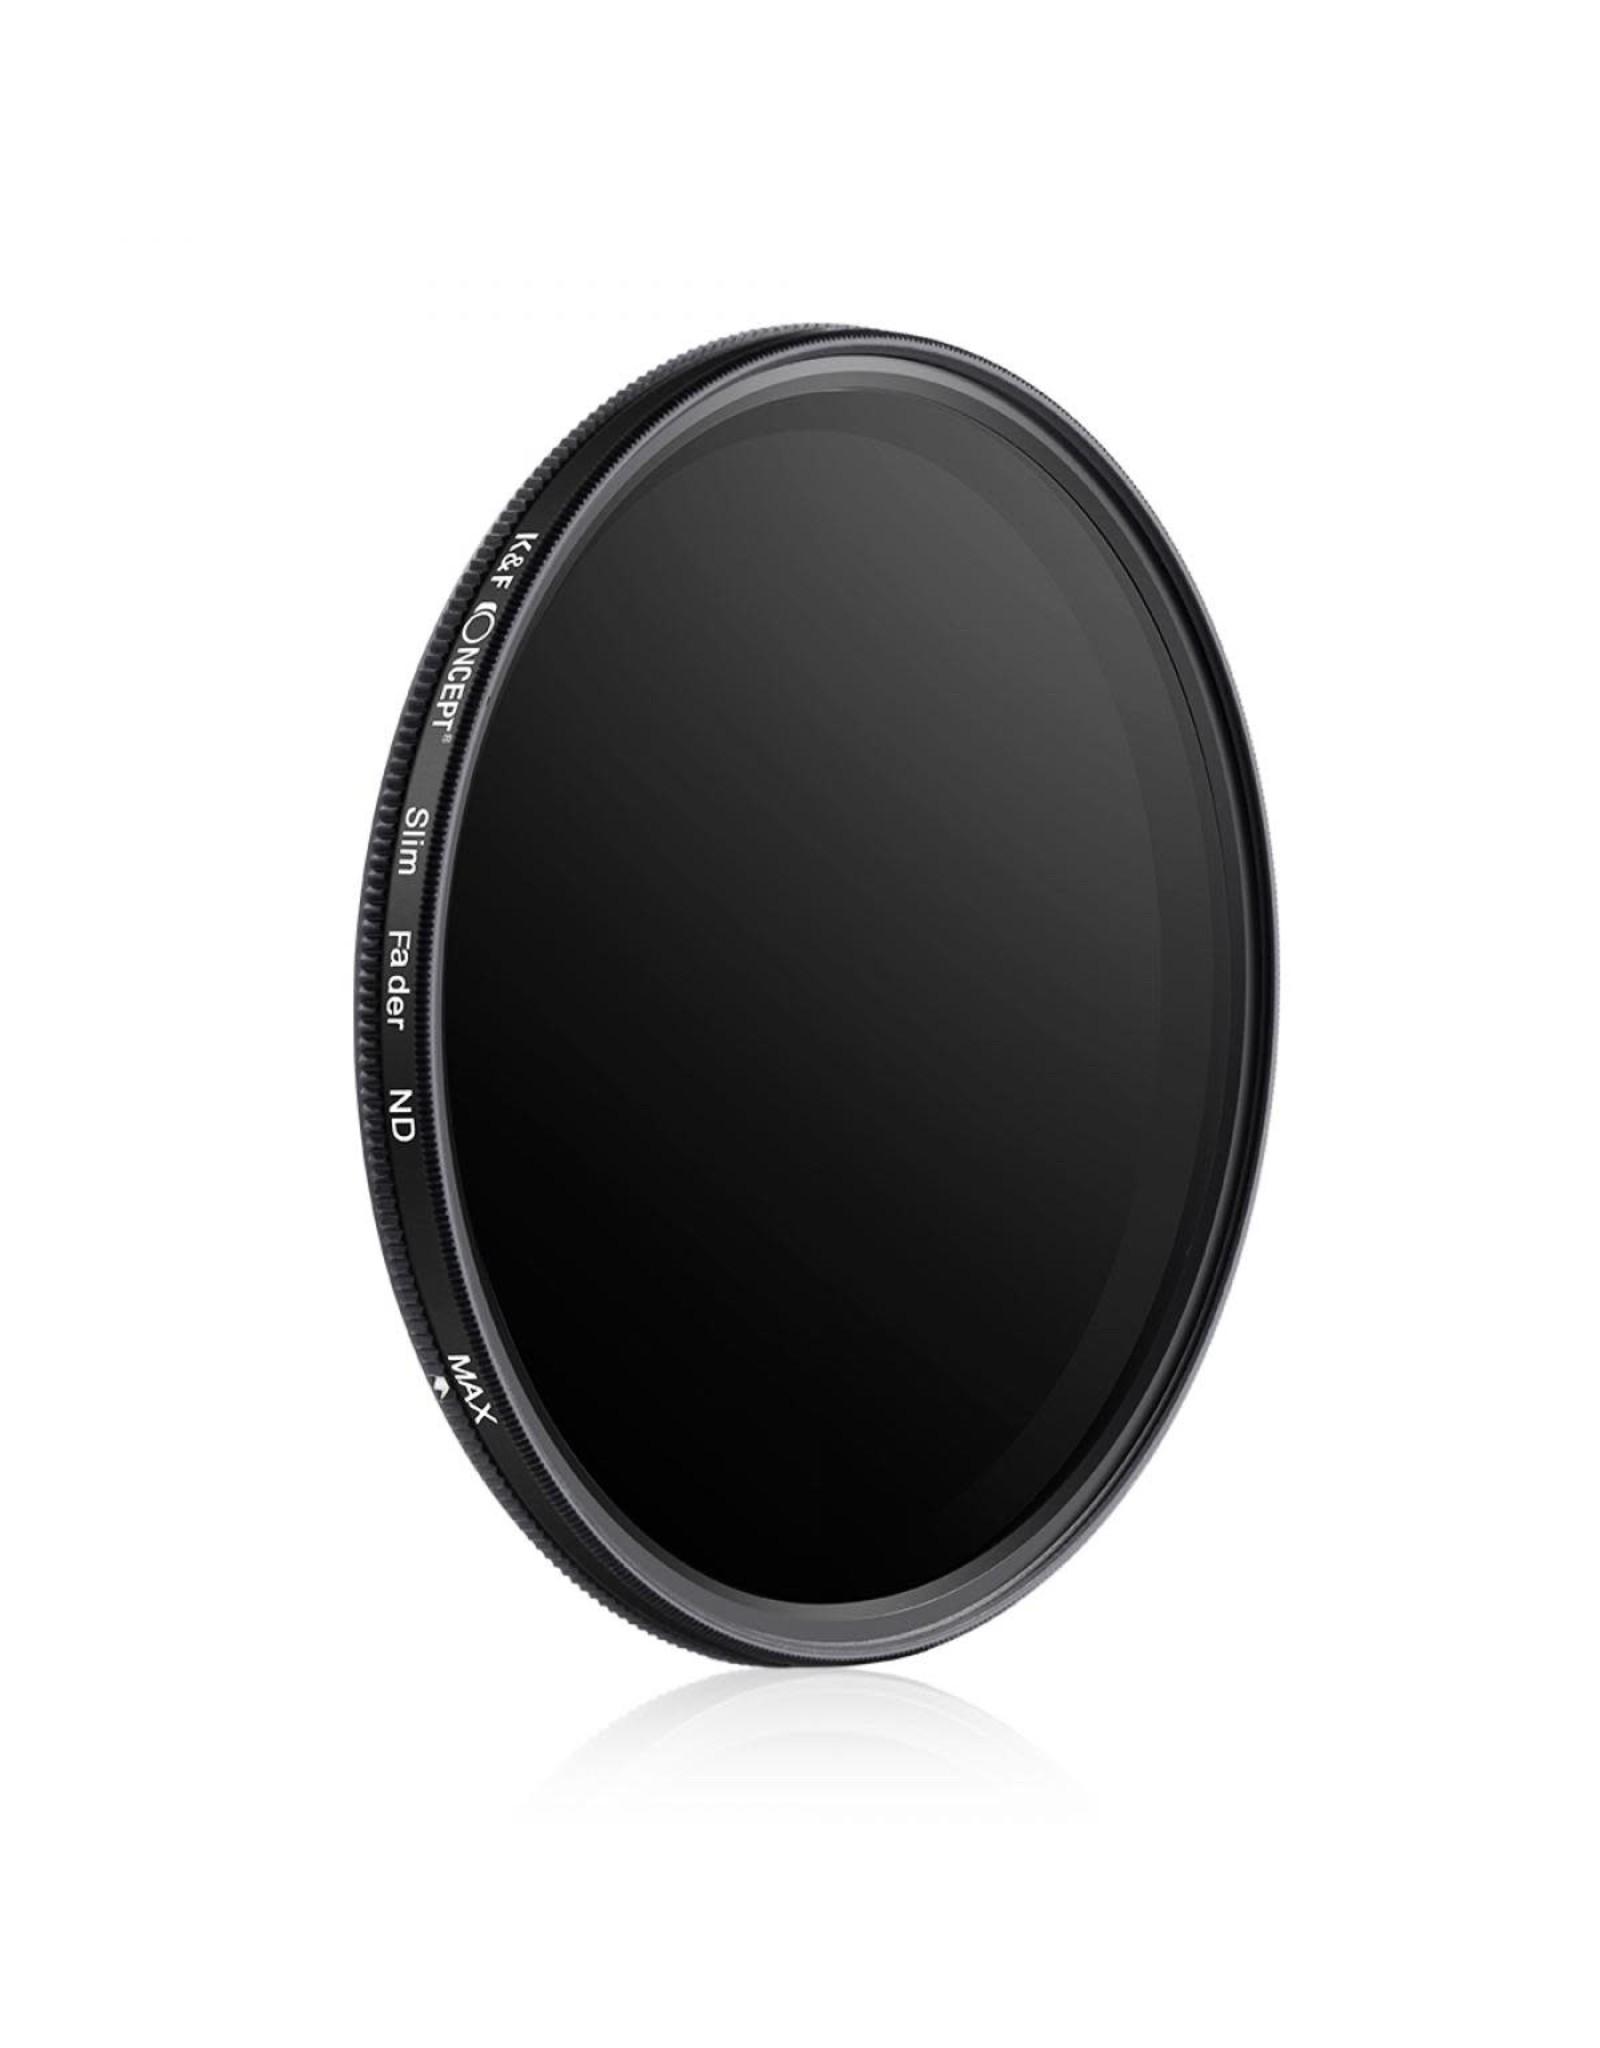 K&F K&F Concept 77mm Variable ND Filter